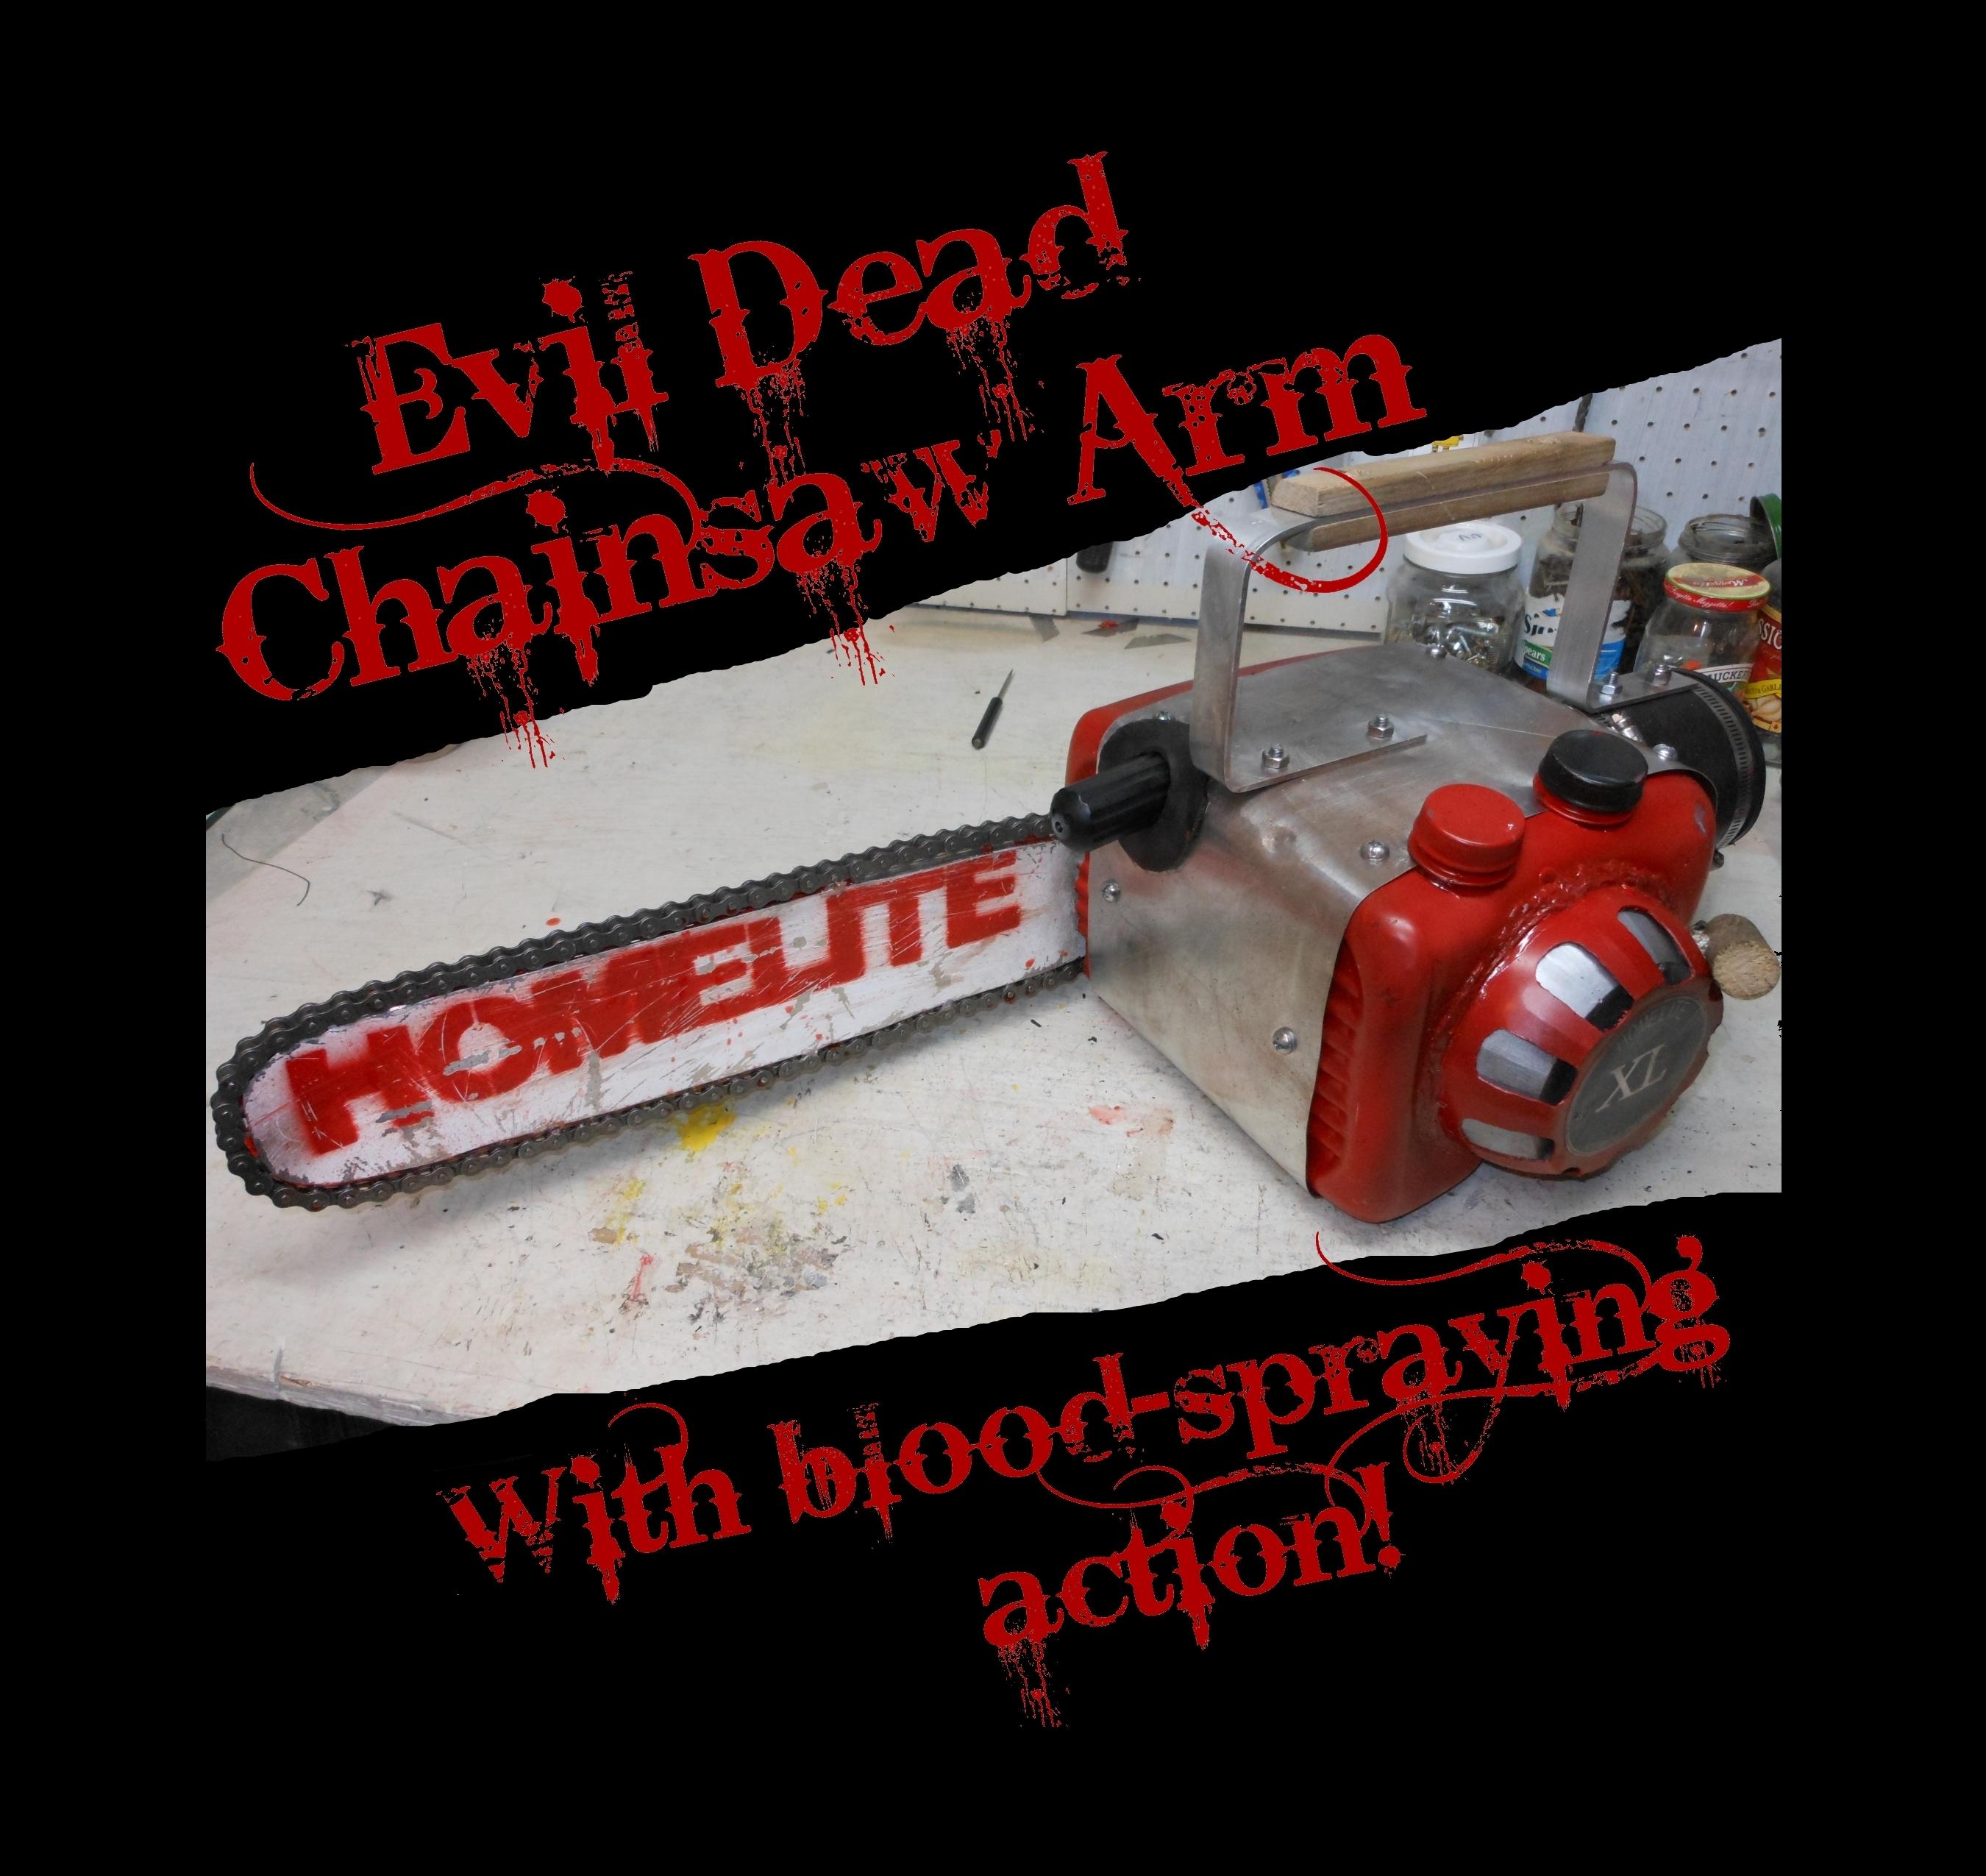 Blood-Spraying Evil Dead Chainsaw Arm!